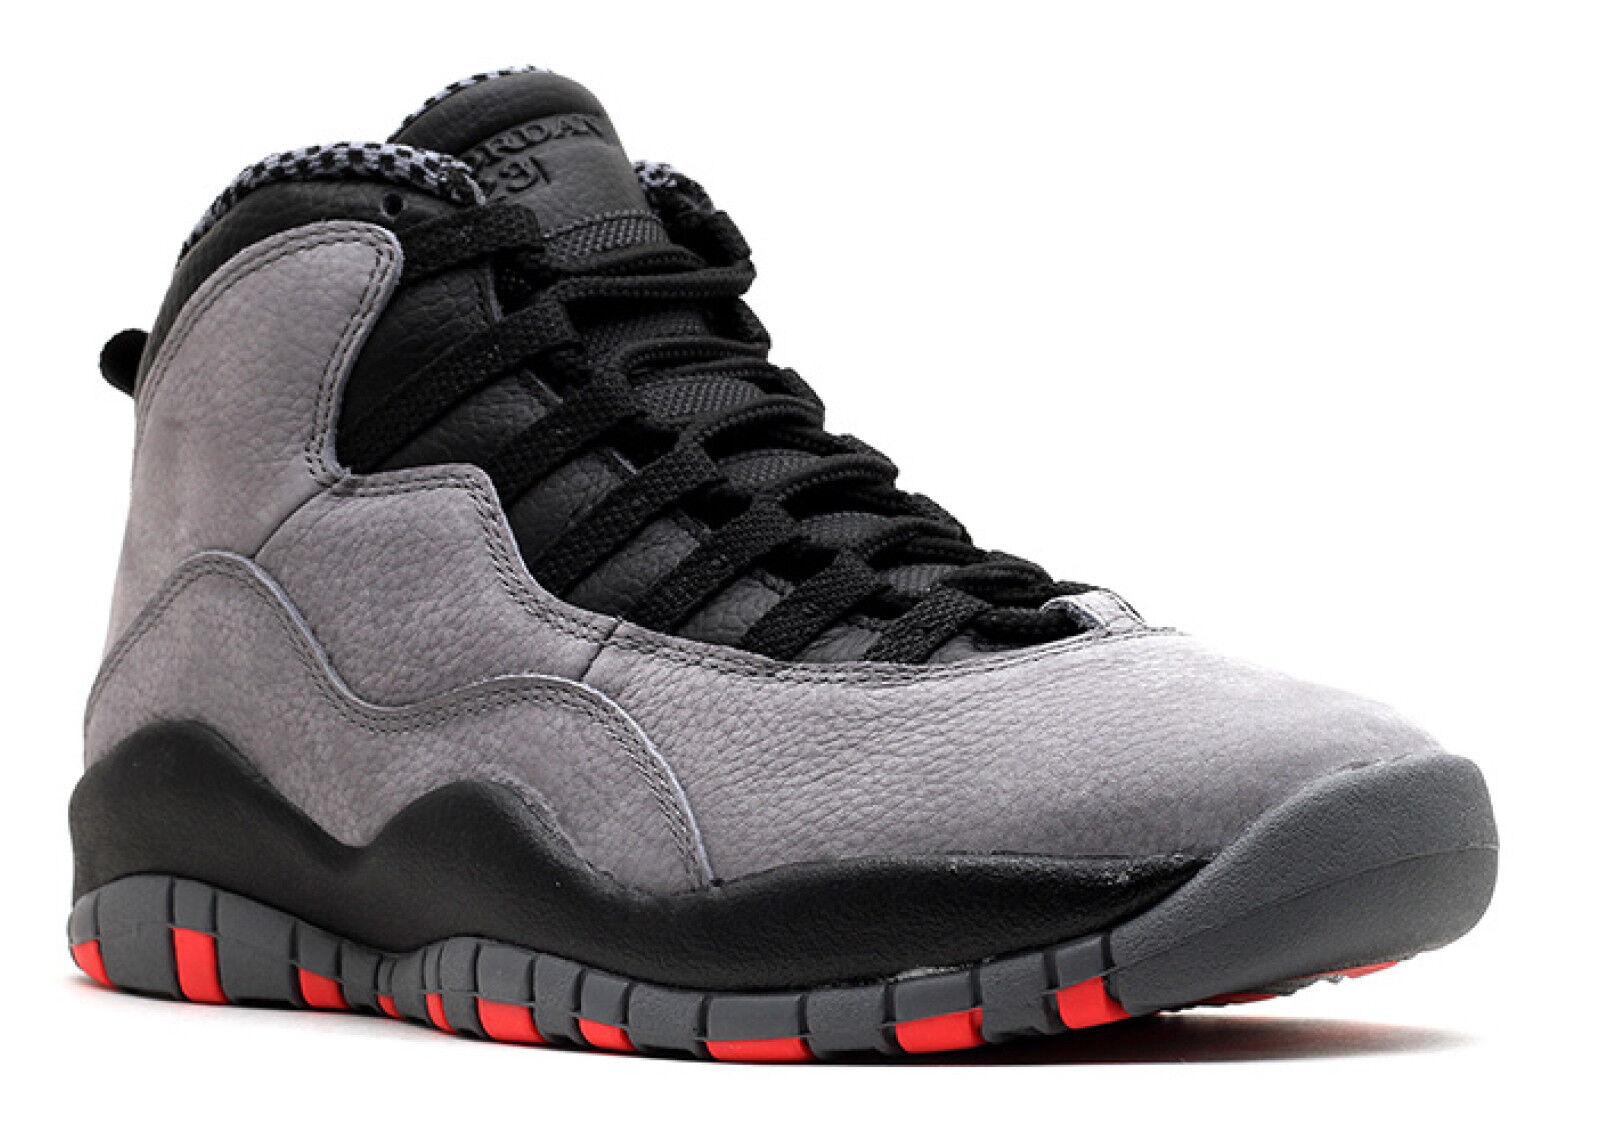 Air Jordan 10 X Retro 'Cool Grey' Infrared Black basketball 310805-023